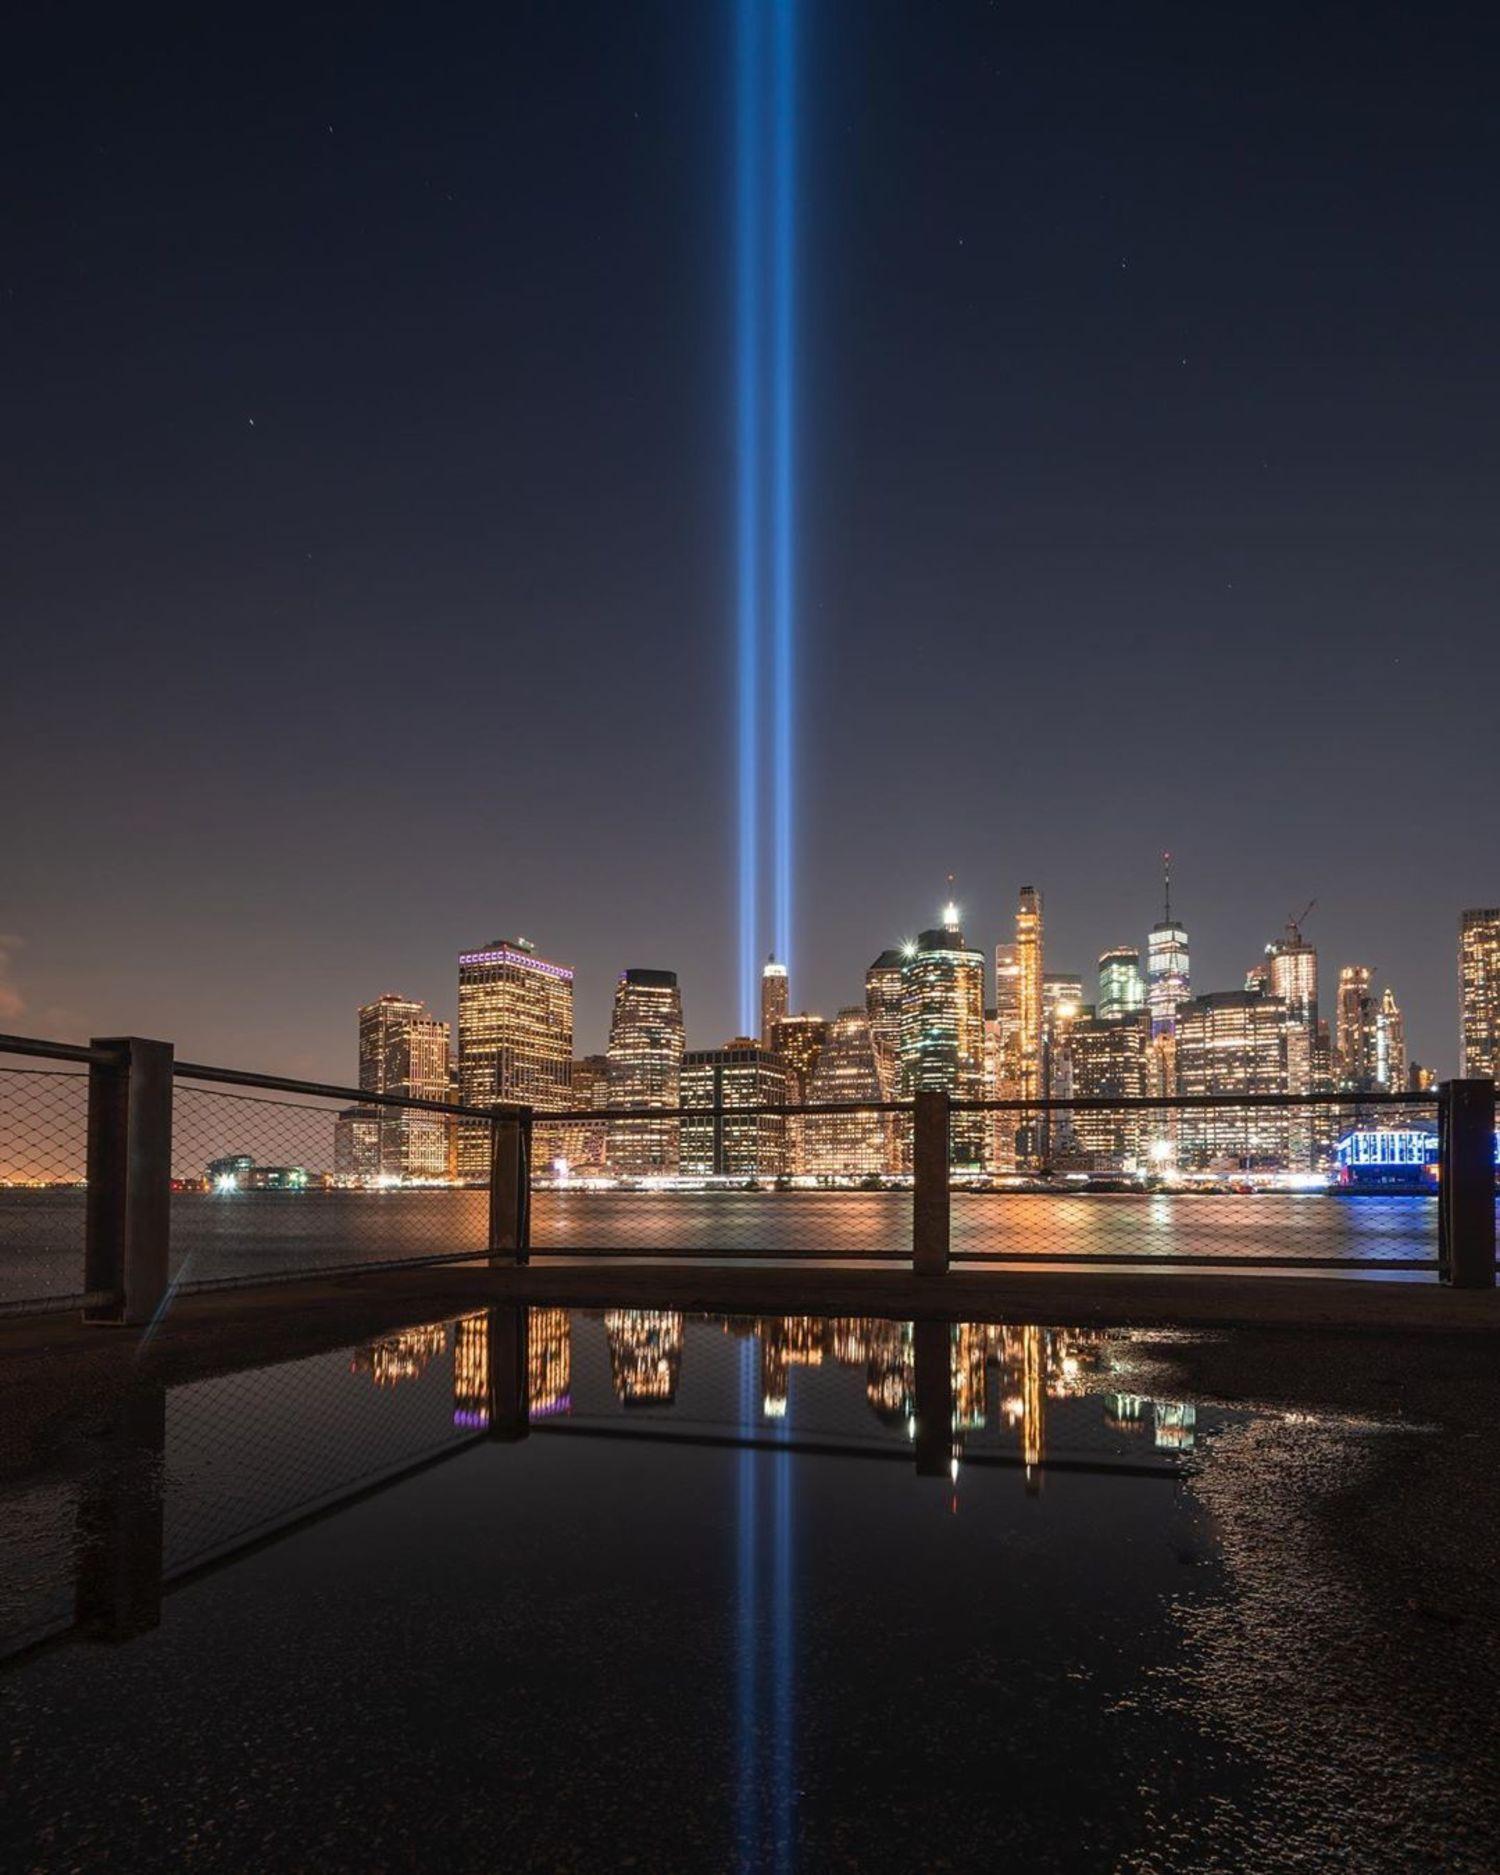 9/11 Tribute in Lights over New York City Skyline